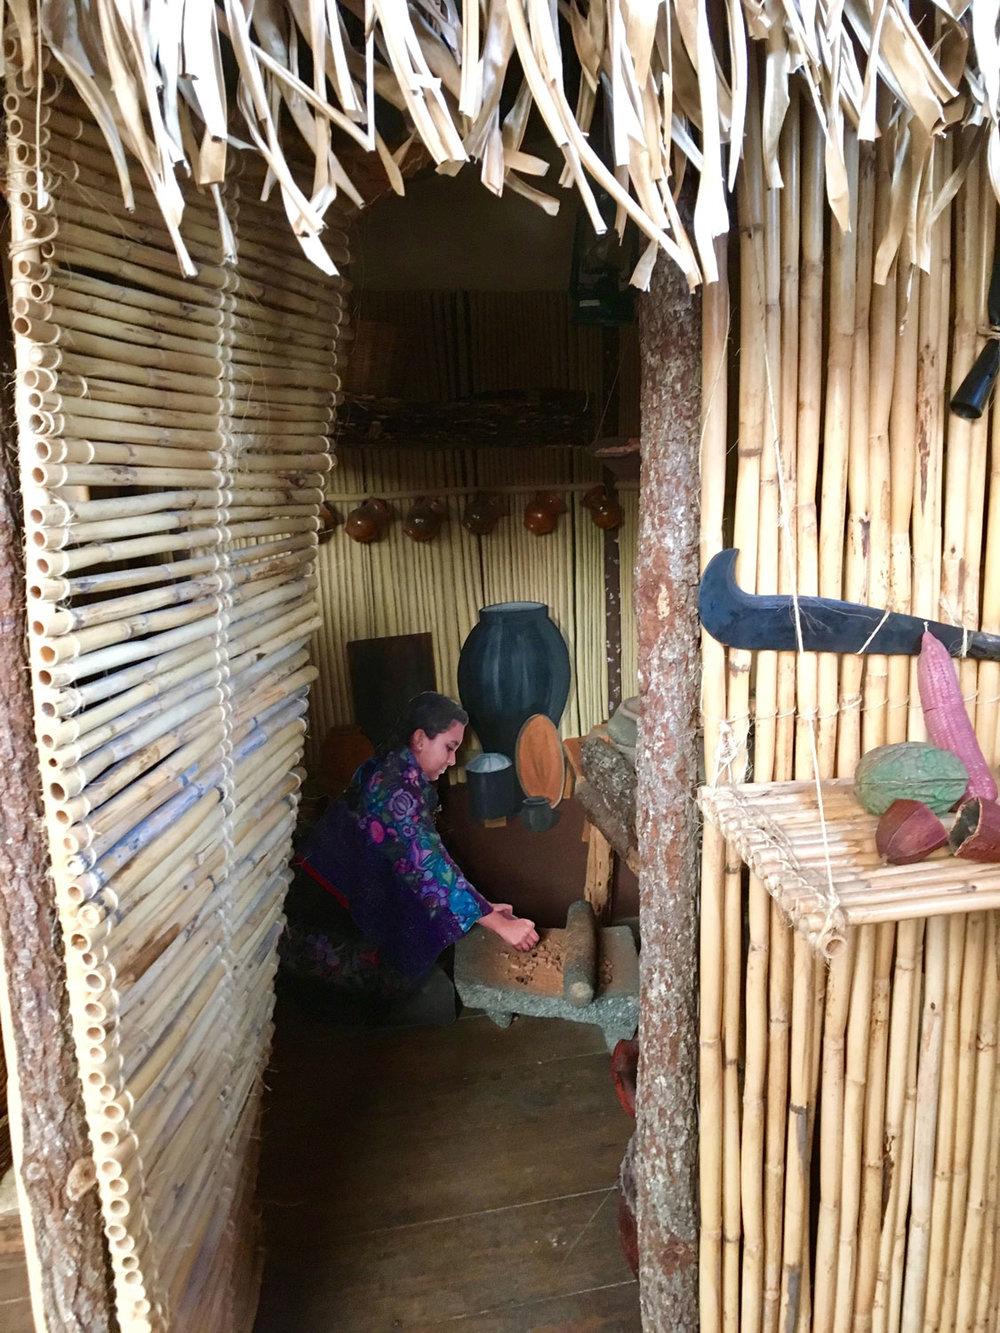 Hammocks_and_Ruins_Blog_Riviera_Maya_Mexico_Travel_Discover_Explore_Musuems_San_Cristobal_Chiapas_Mexico_Cacao_Chocolate_Museum_17.jpg